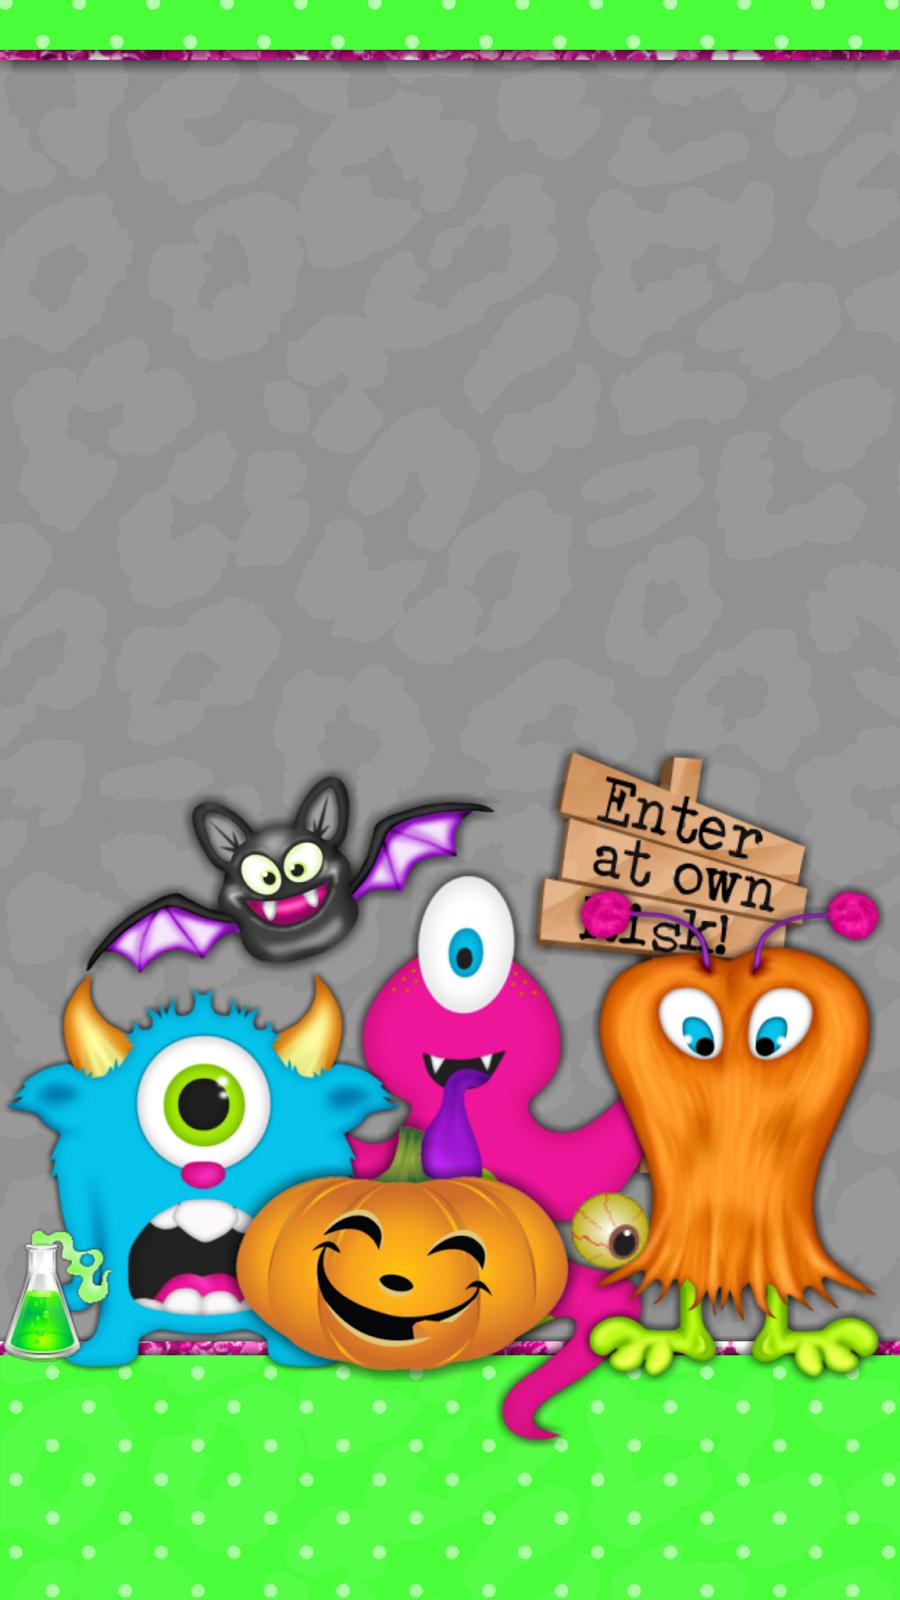 Download Wallpaper Halloween Pinterest - d76a199bafd3de198e1ad6a45a23dcdc  Gallery_585819.png